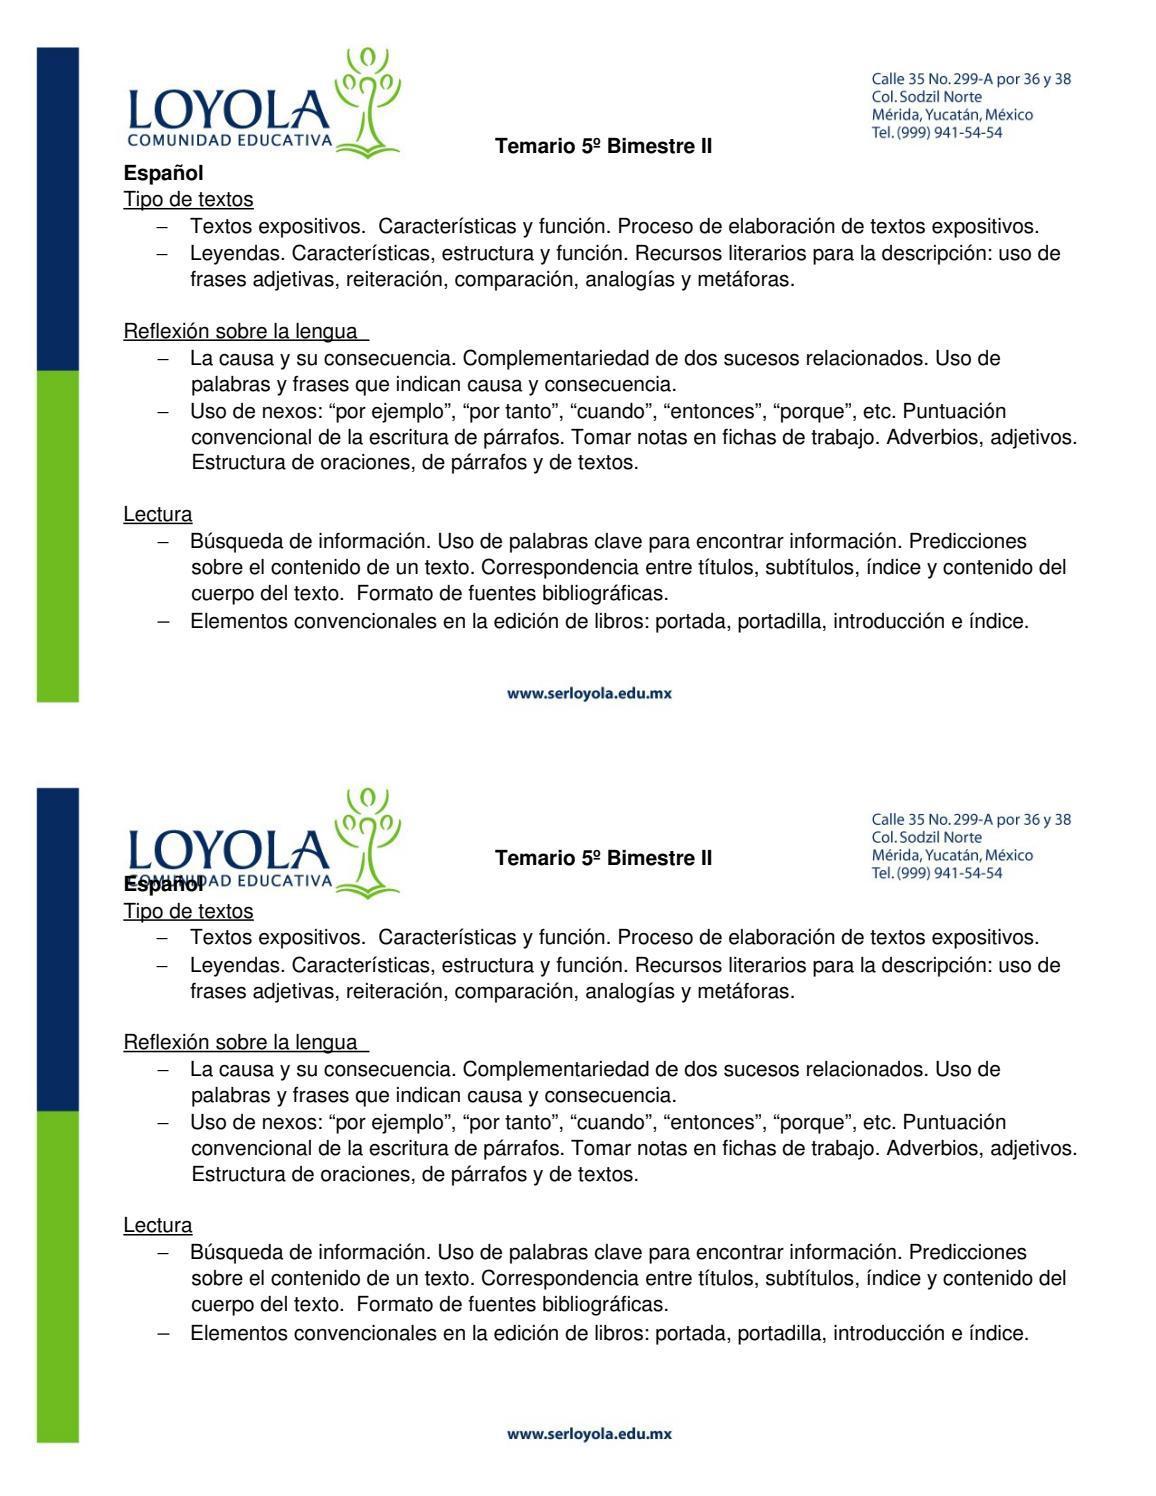 Temario Español 5° Bim II by Loyola Comunidad Educativa - issuu